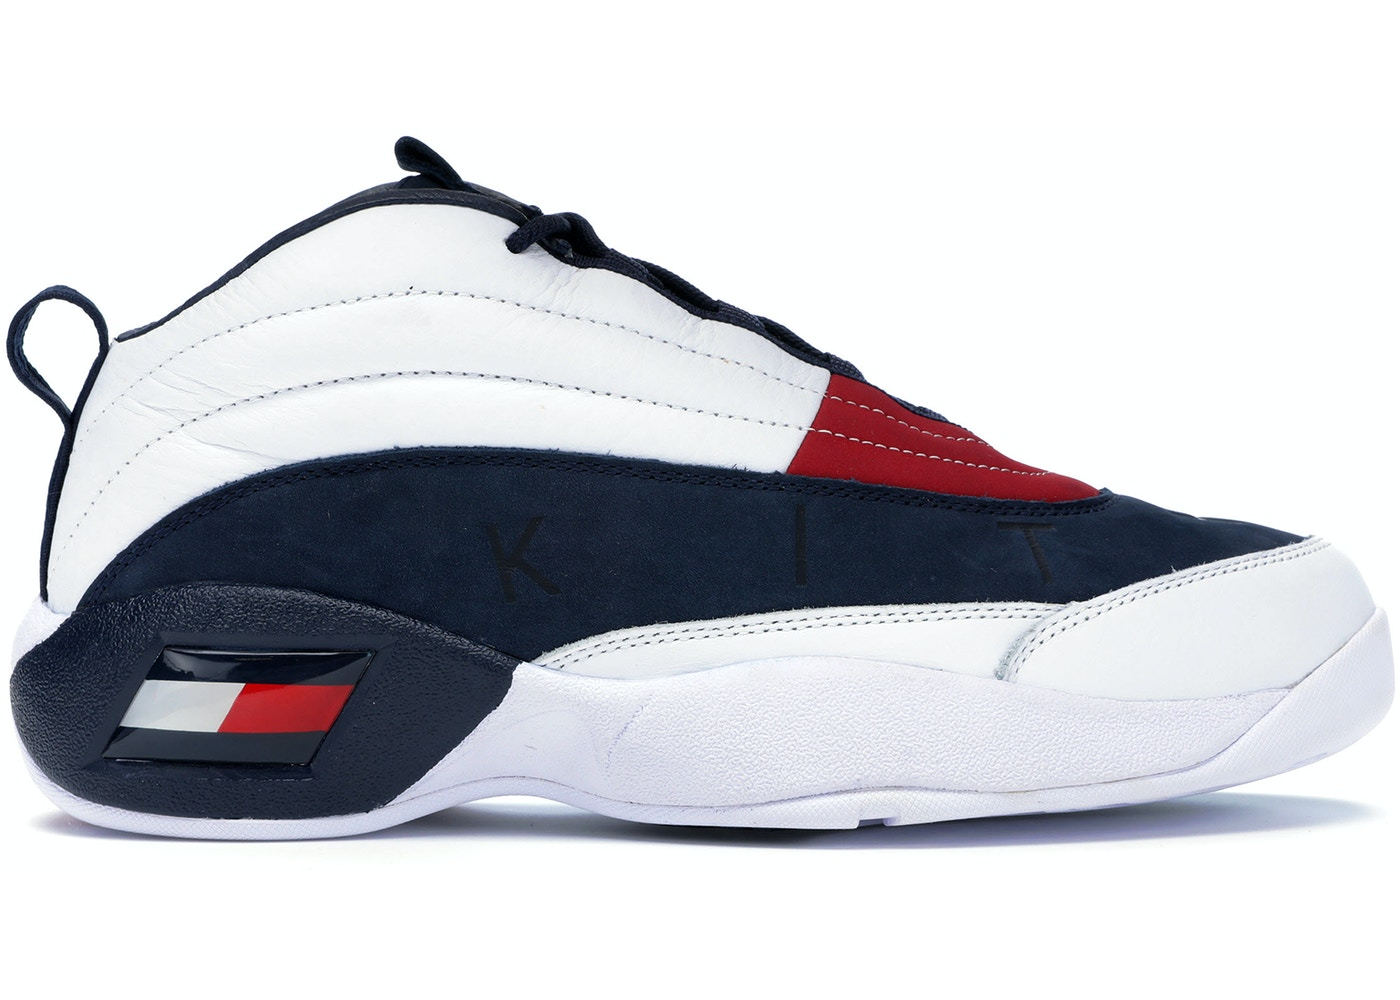 5e43062fc Tommy Hilfiger Skew Lux Basketball Sneaker Kith White - KH9243-100